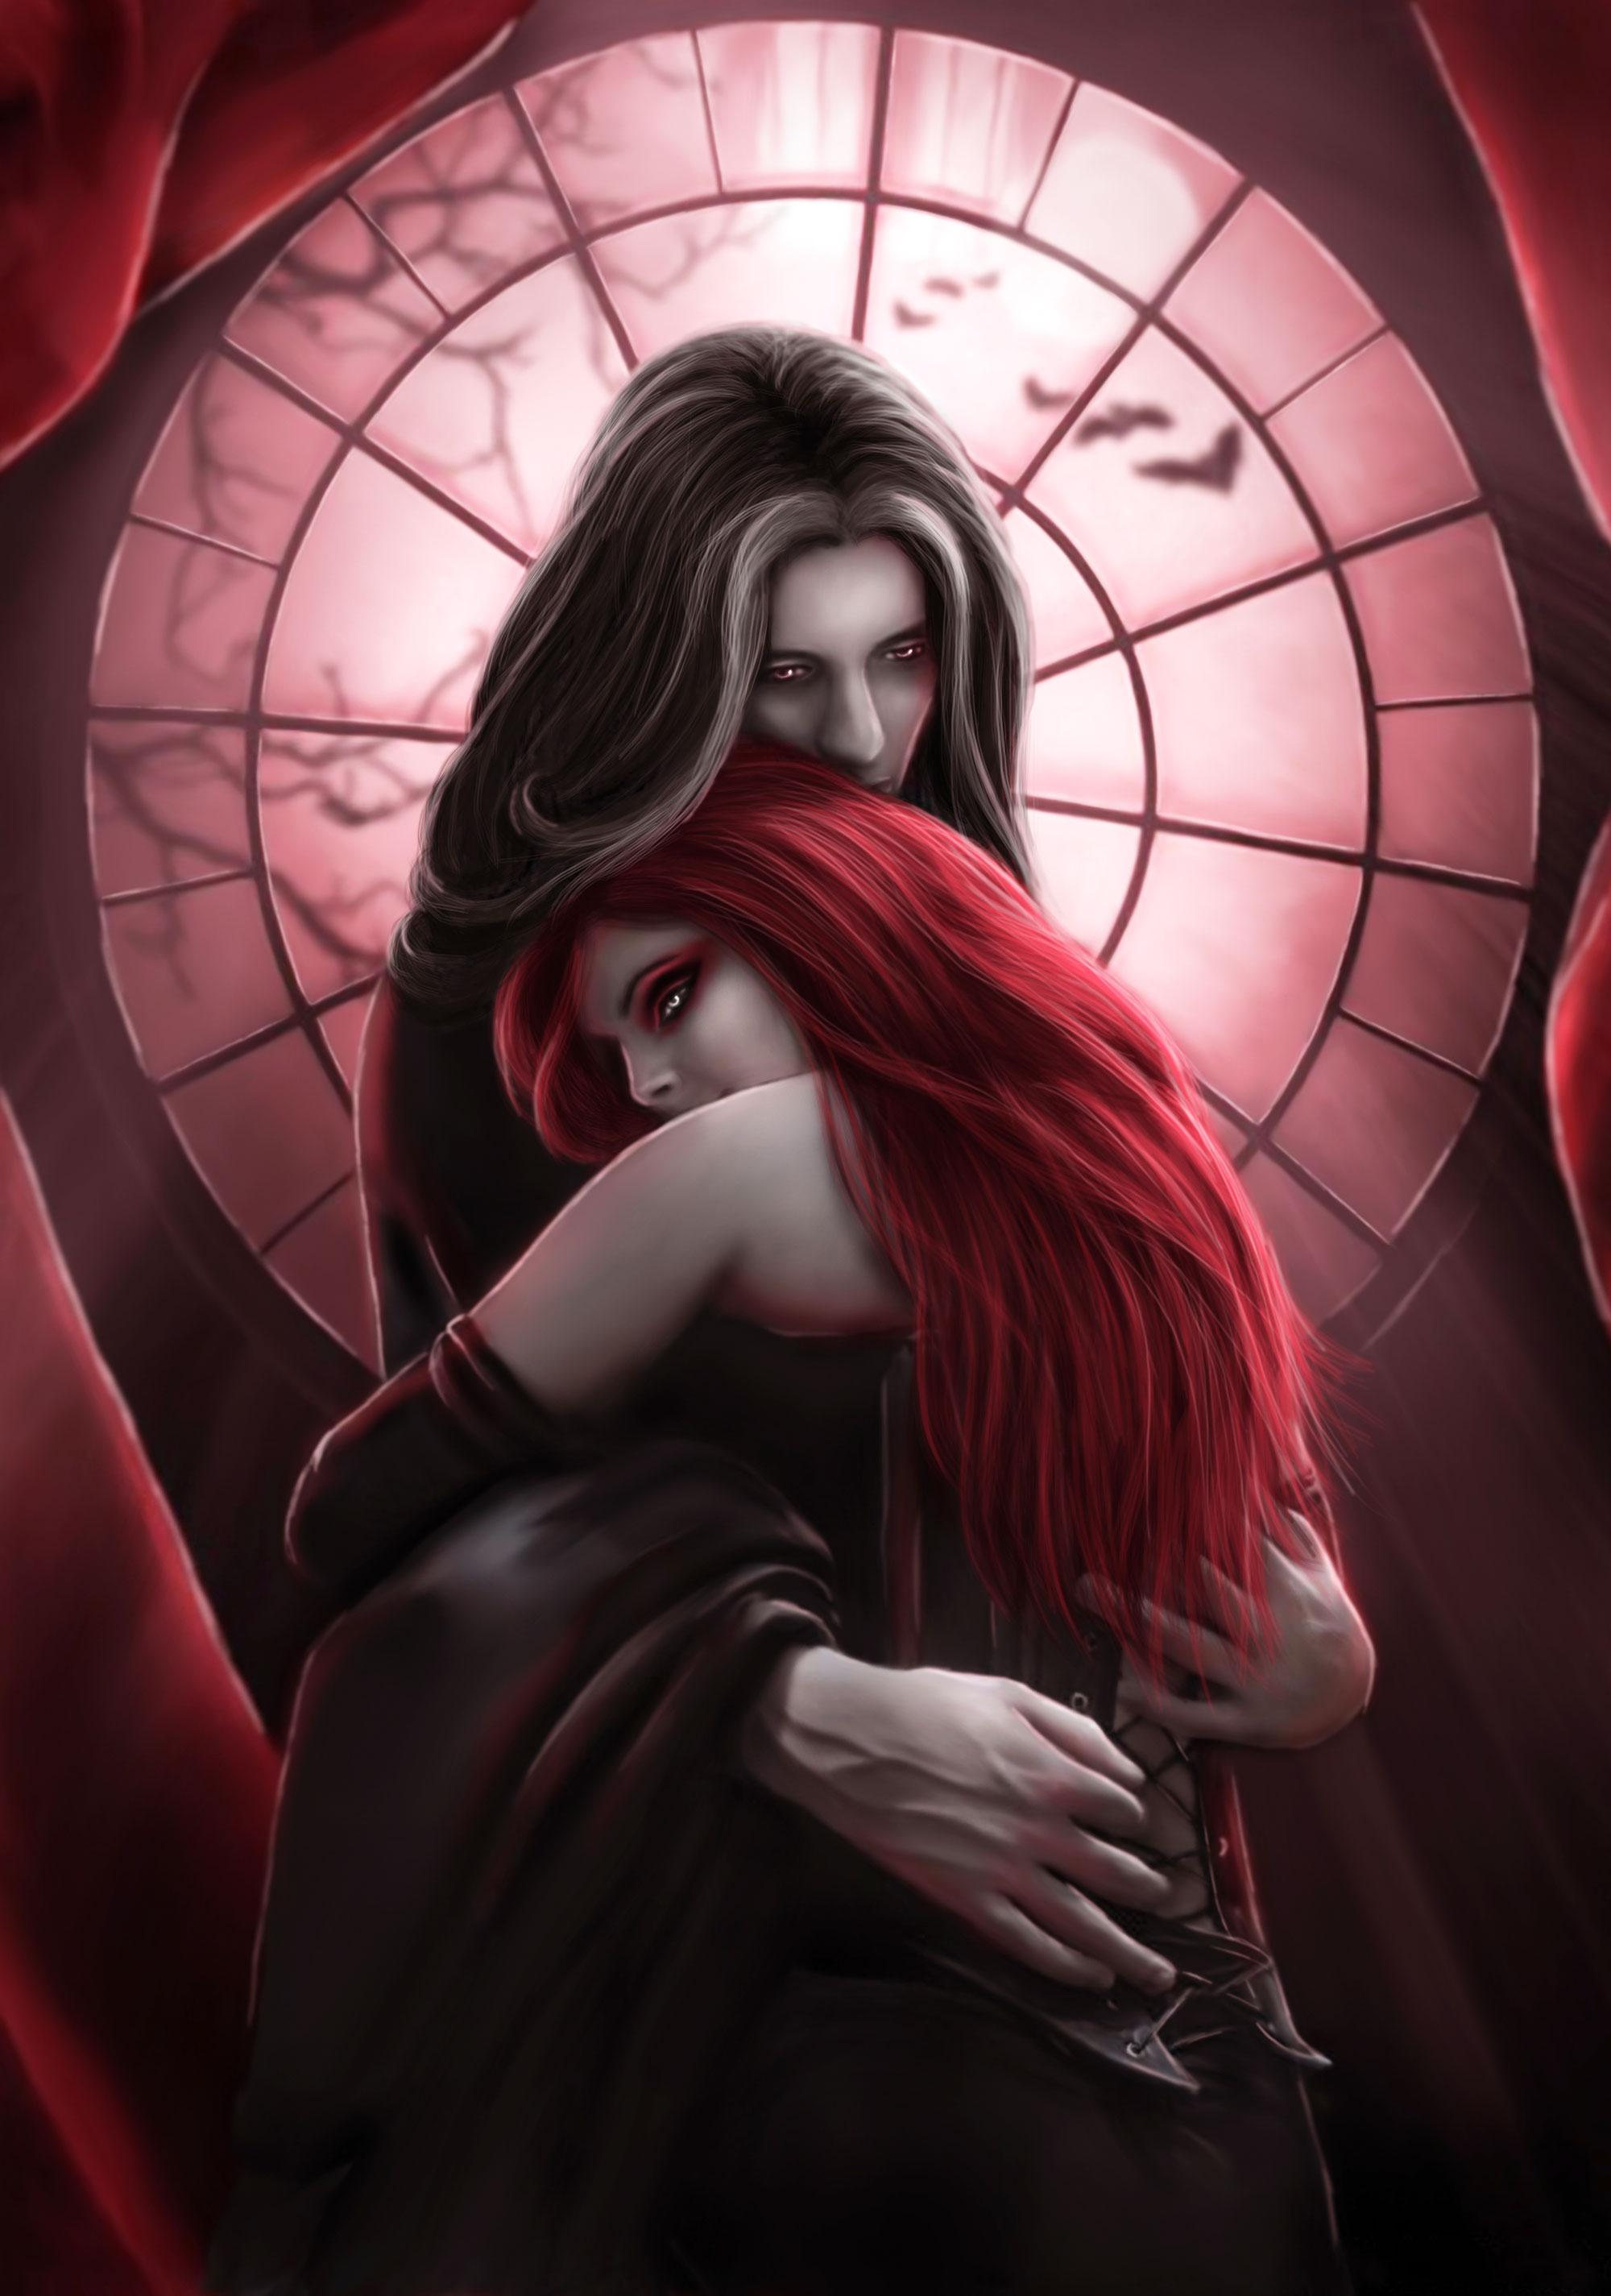 Drawn vampire pretty female In Most Seen Beautiful The